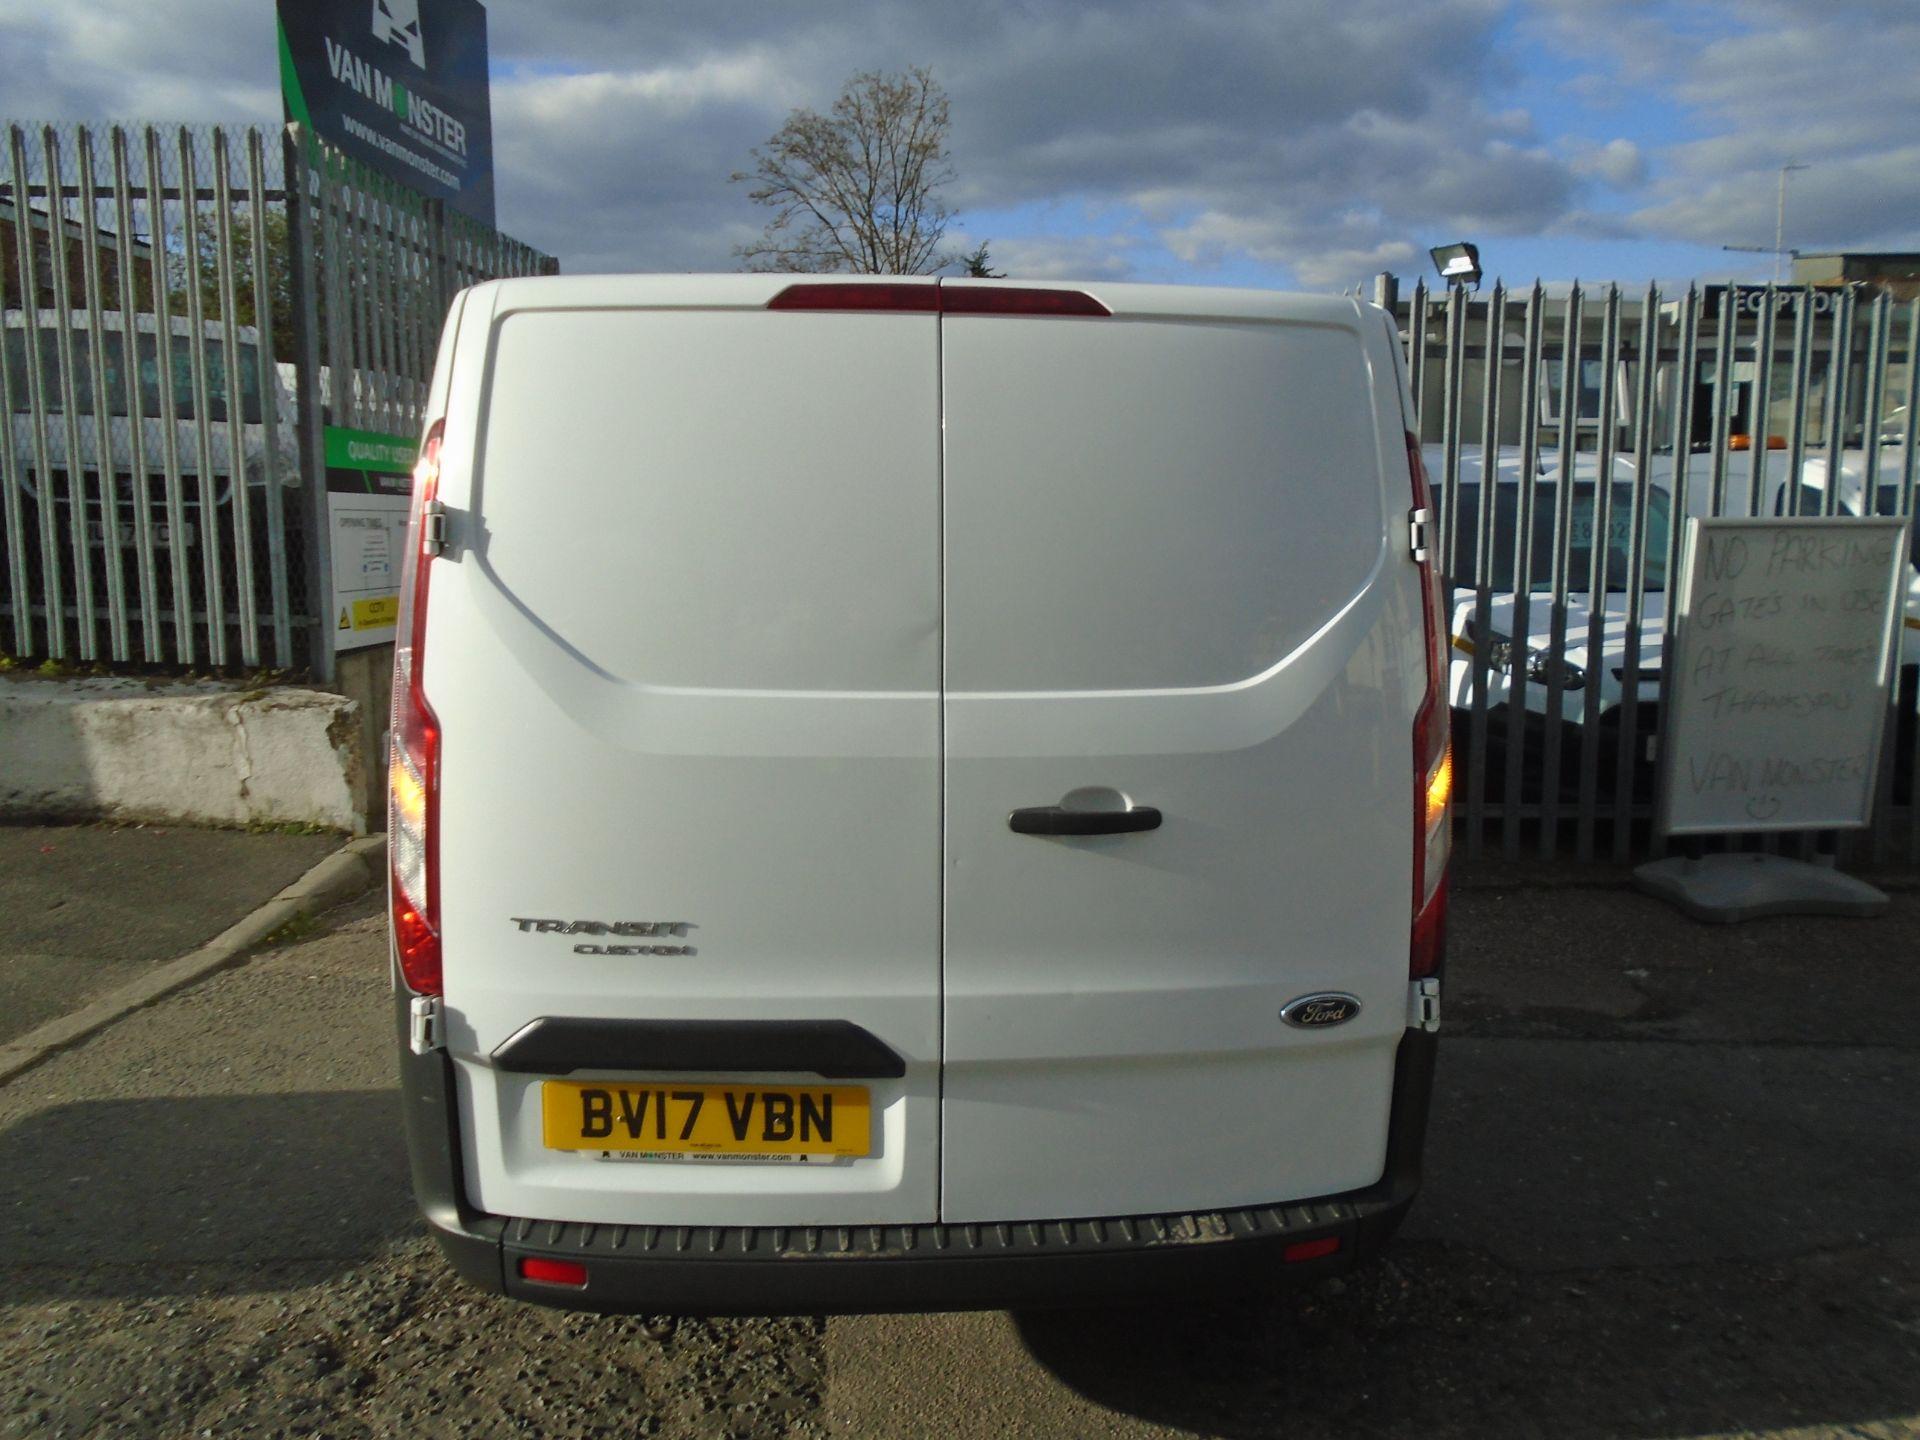 2017 Ford Transit Custom 2.0 Tdci 105Ps Low Roof Van (BV17VBN) Image 5